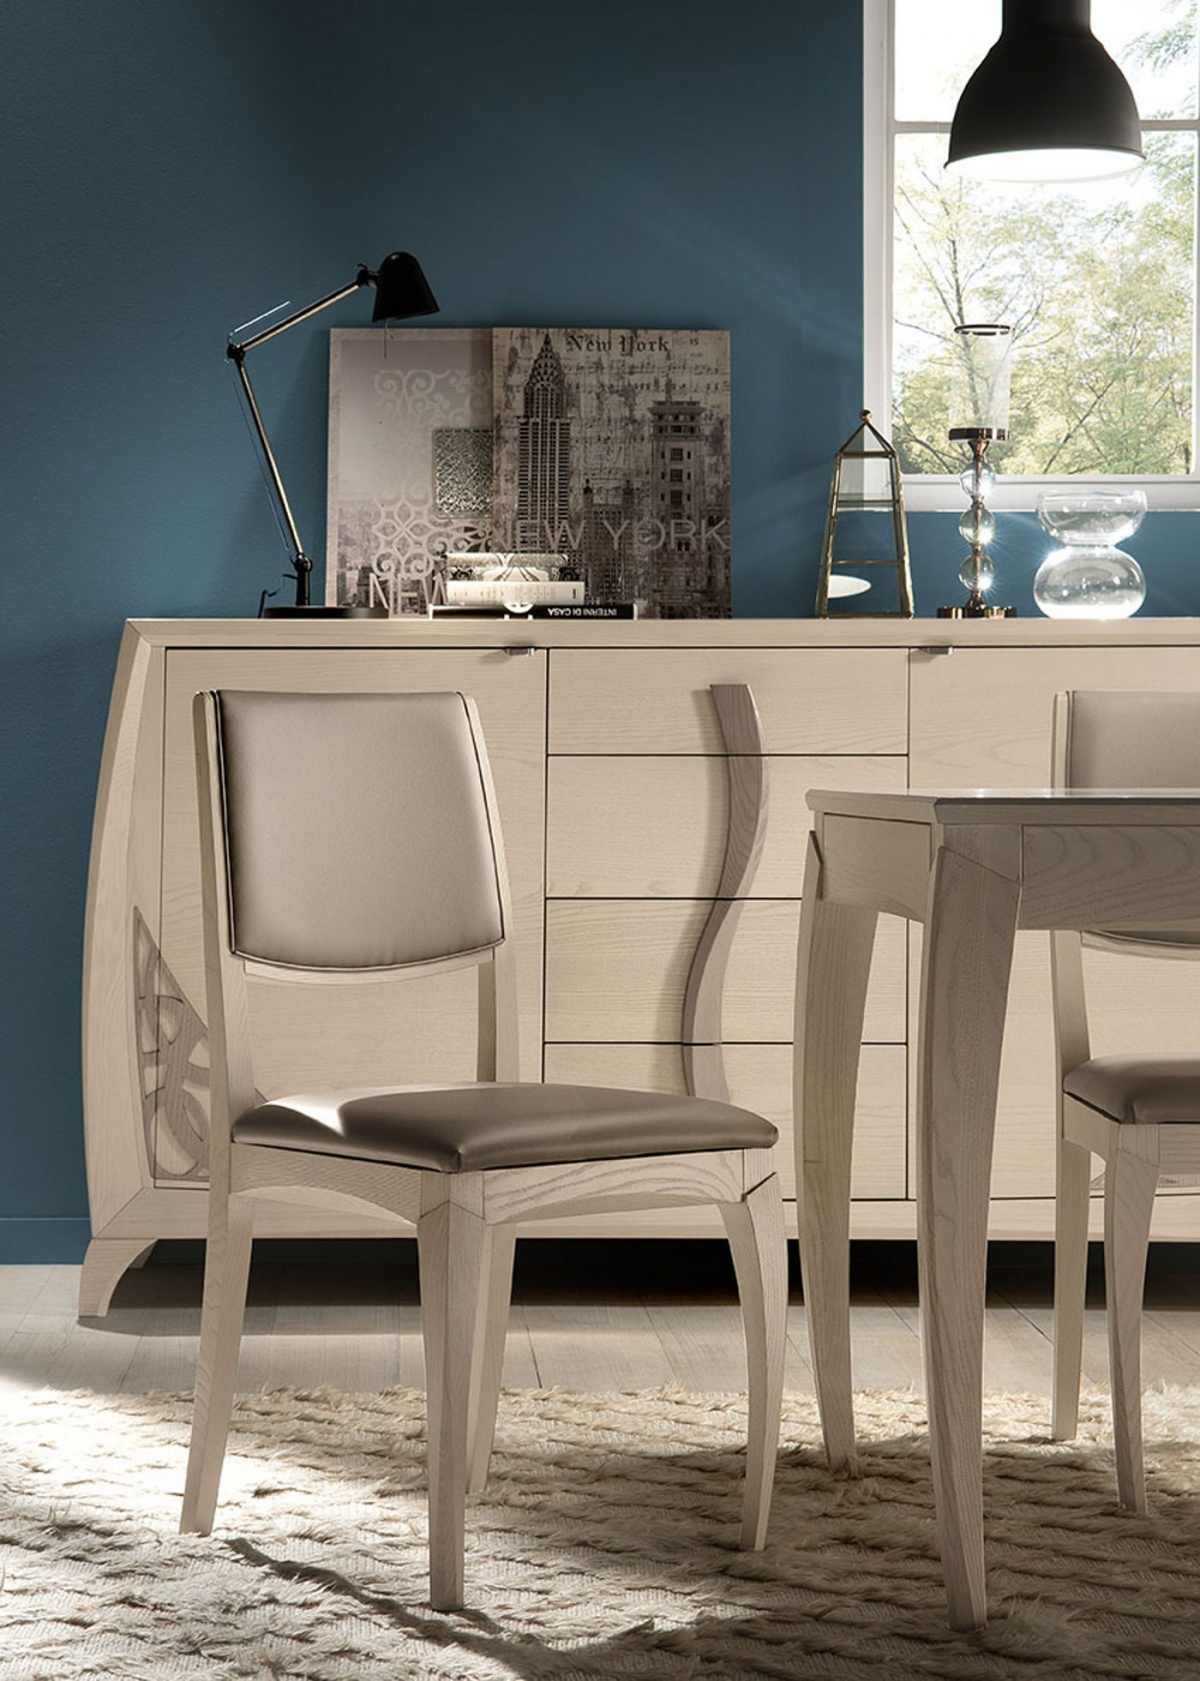 Tavoli e sedie in stile moderno dane mobili - Deco mobili tavoli e sedie ...